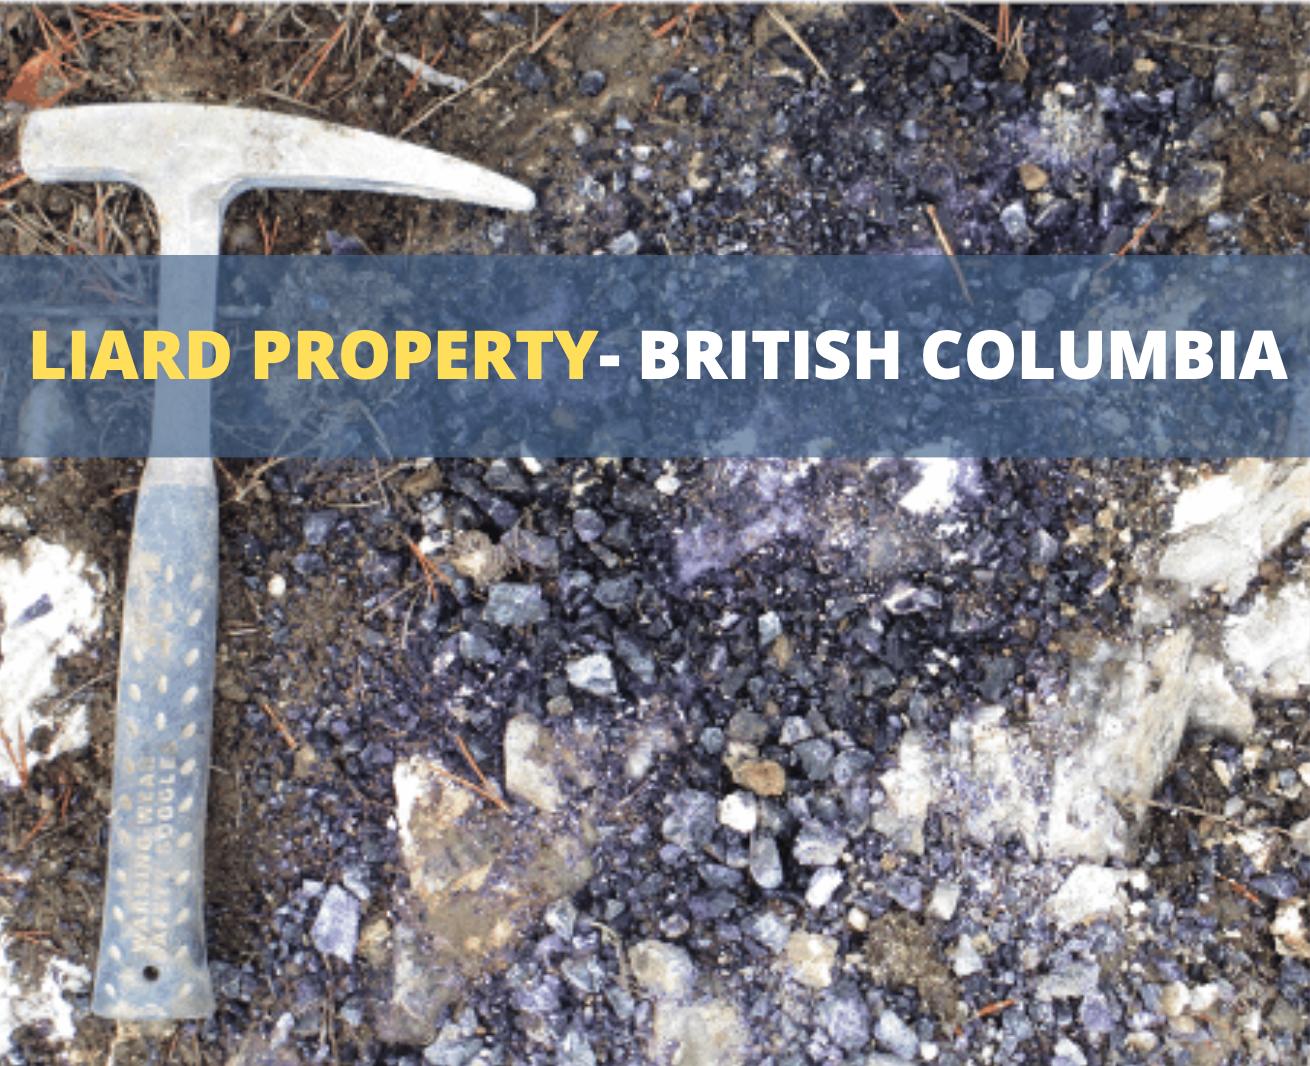 Liard Property - British Columbia